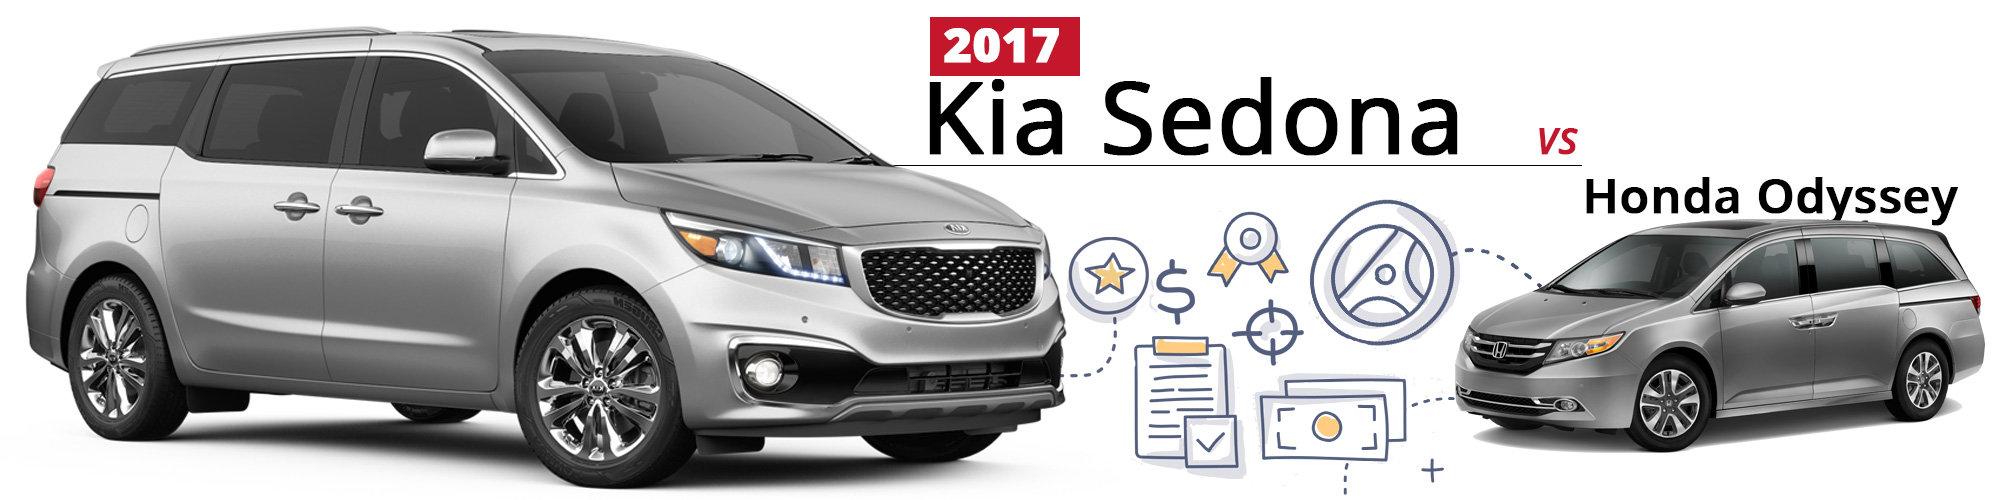 Kia Sedona vs. Honda Odyssey